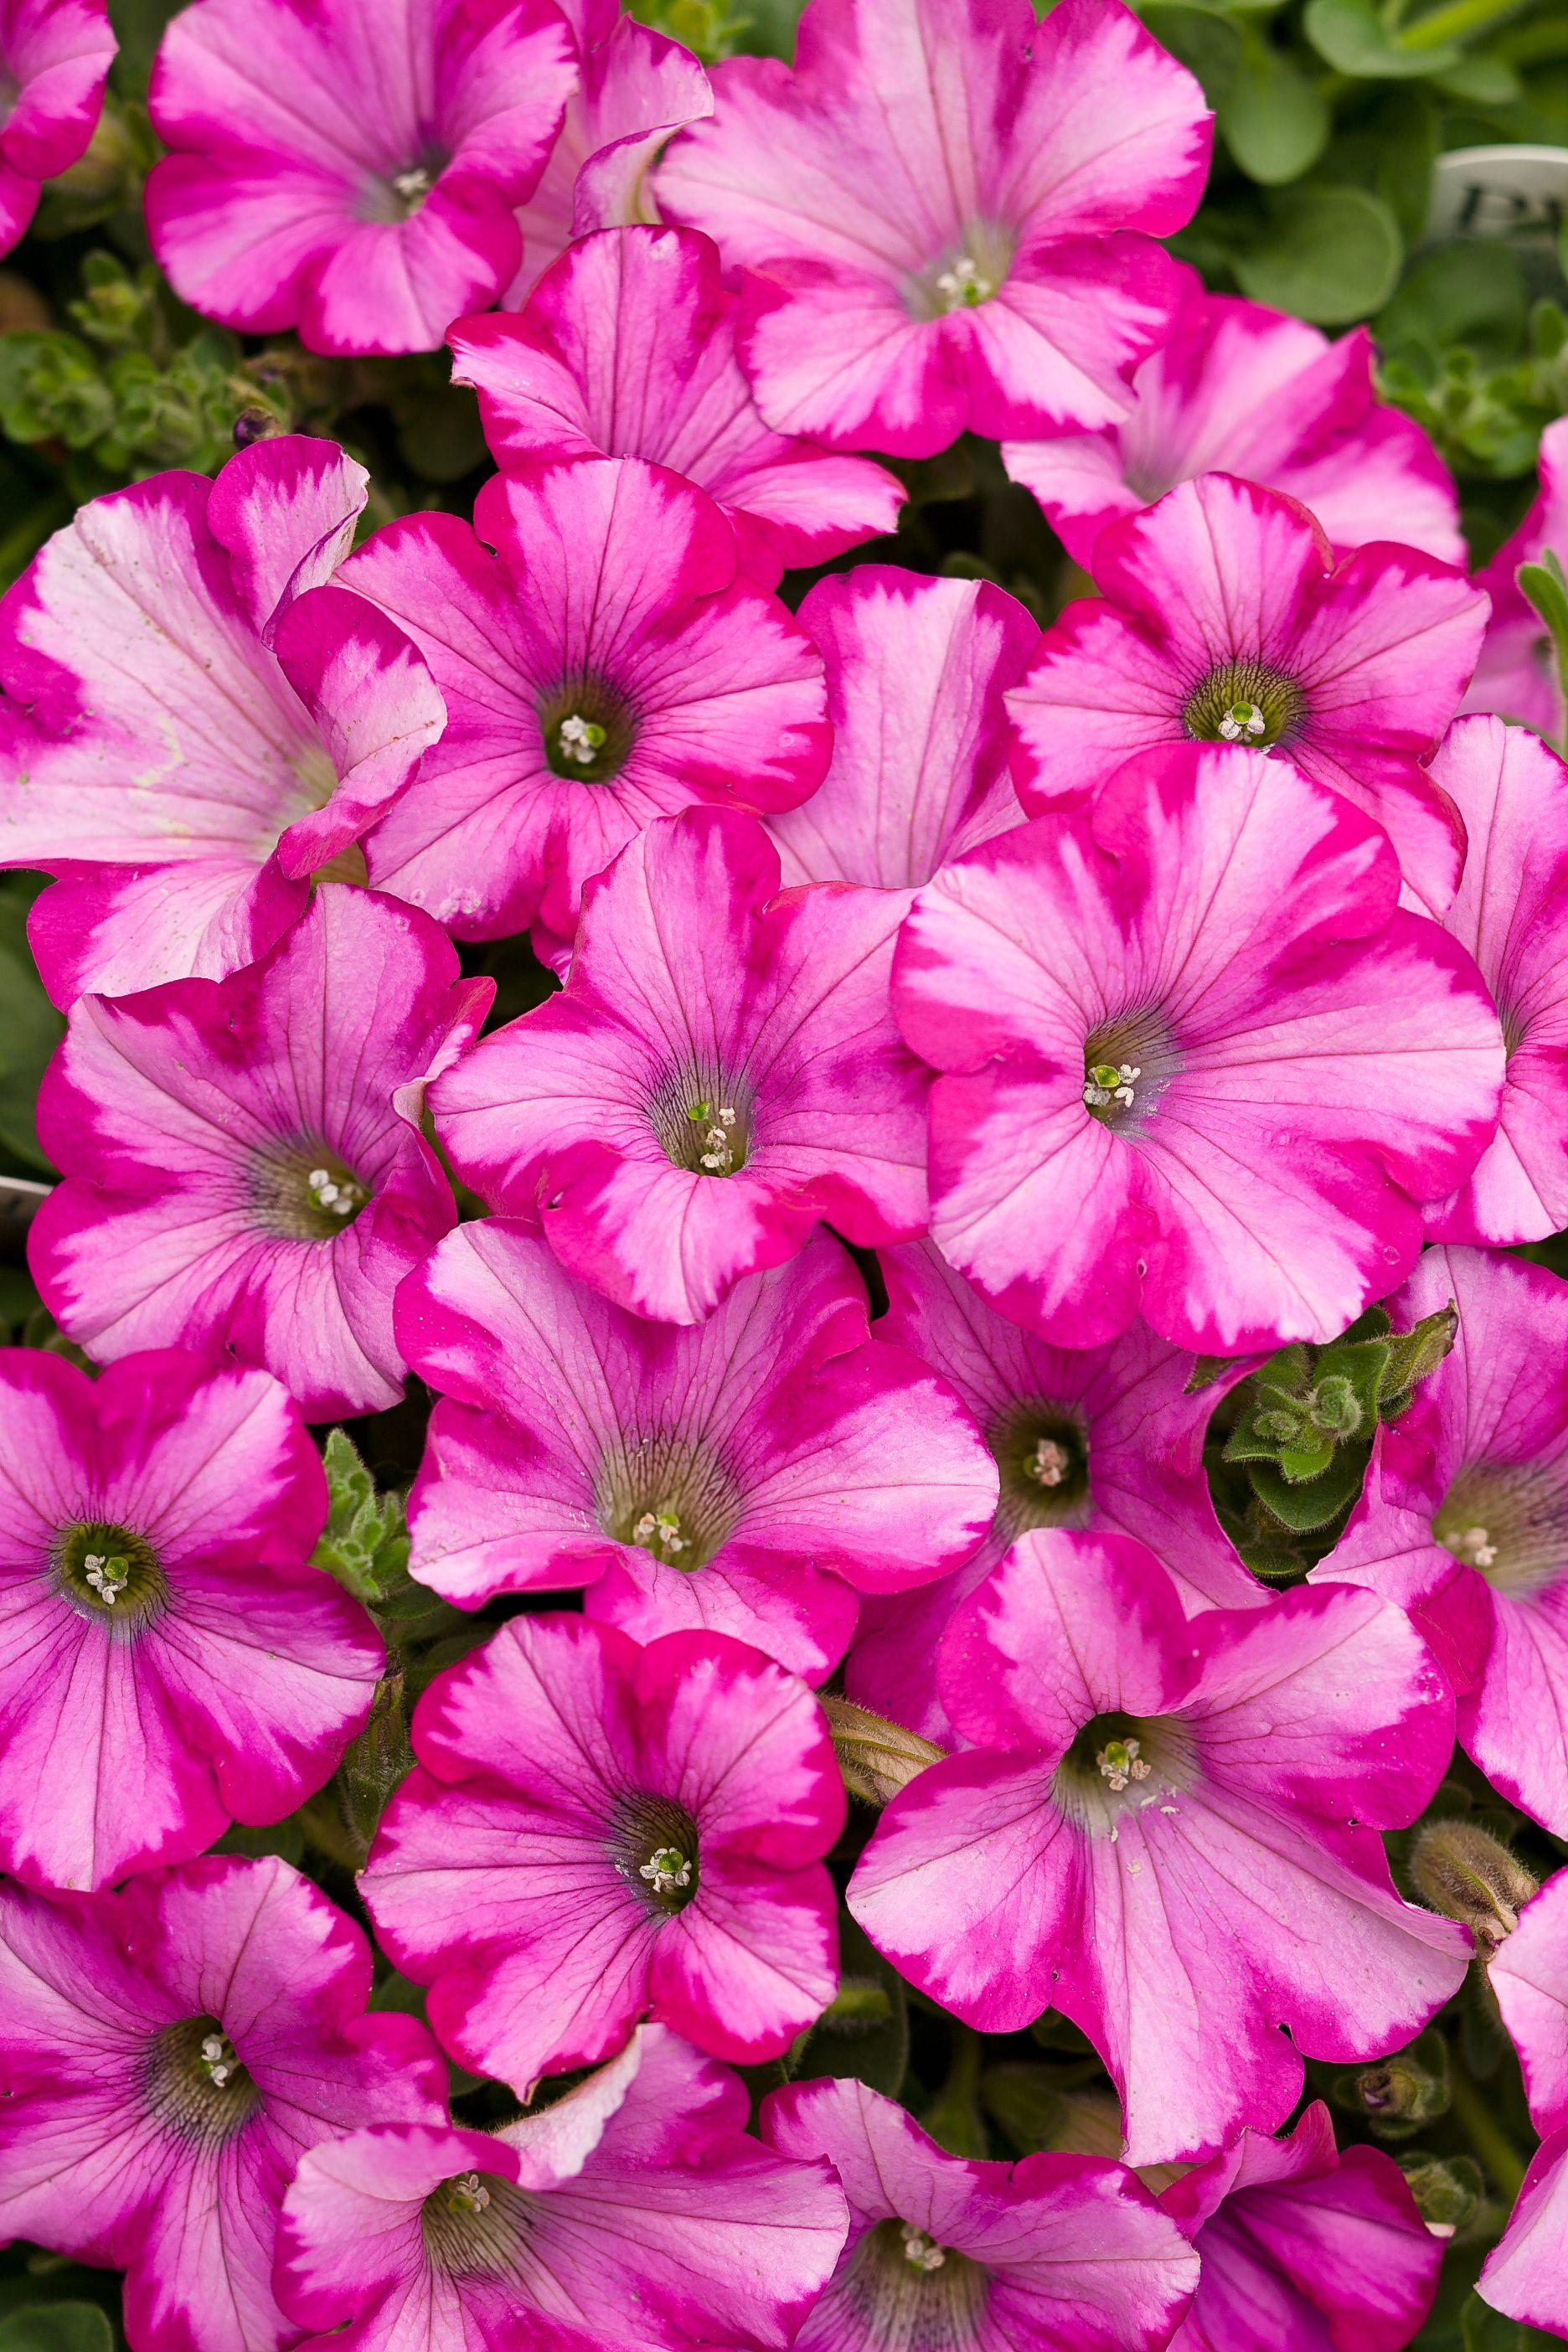 Supertunia Raspberry Blast Petunia Hybrid Annual Flowers Petunia Plant Petunias